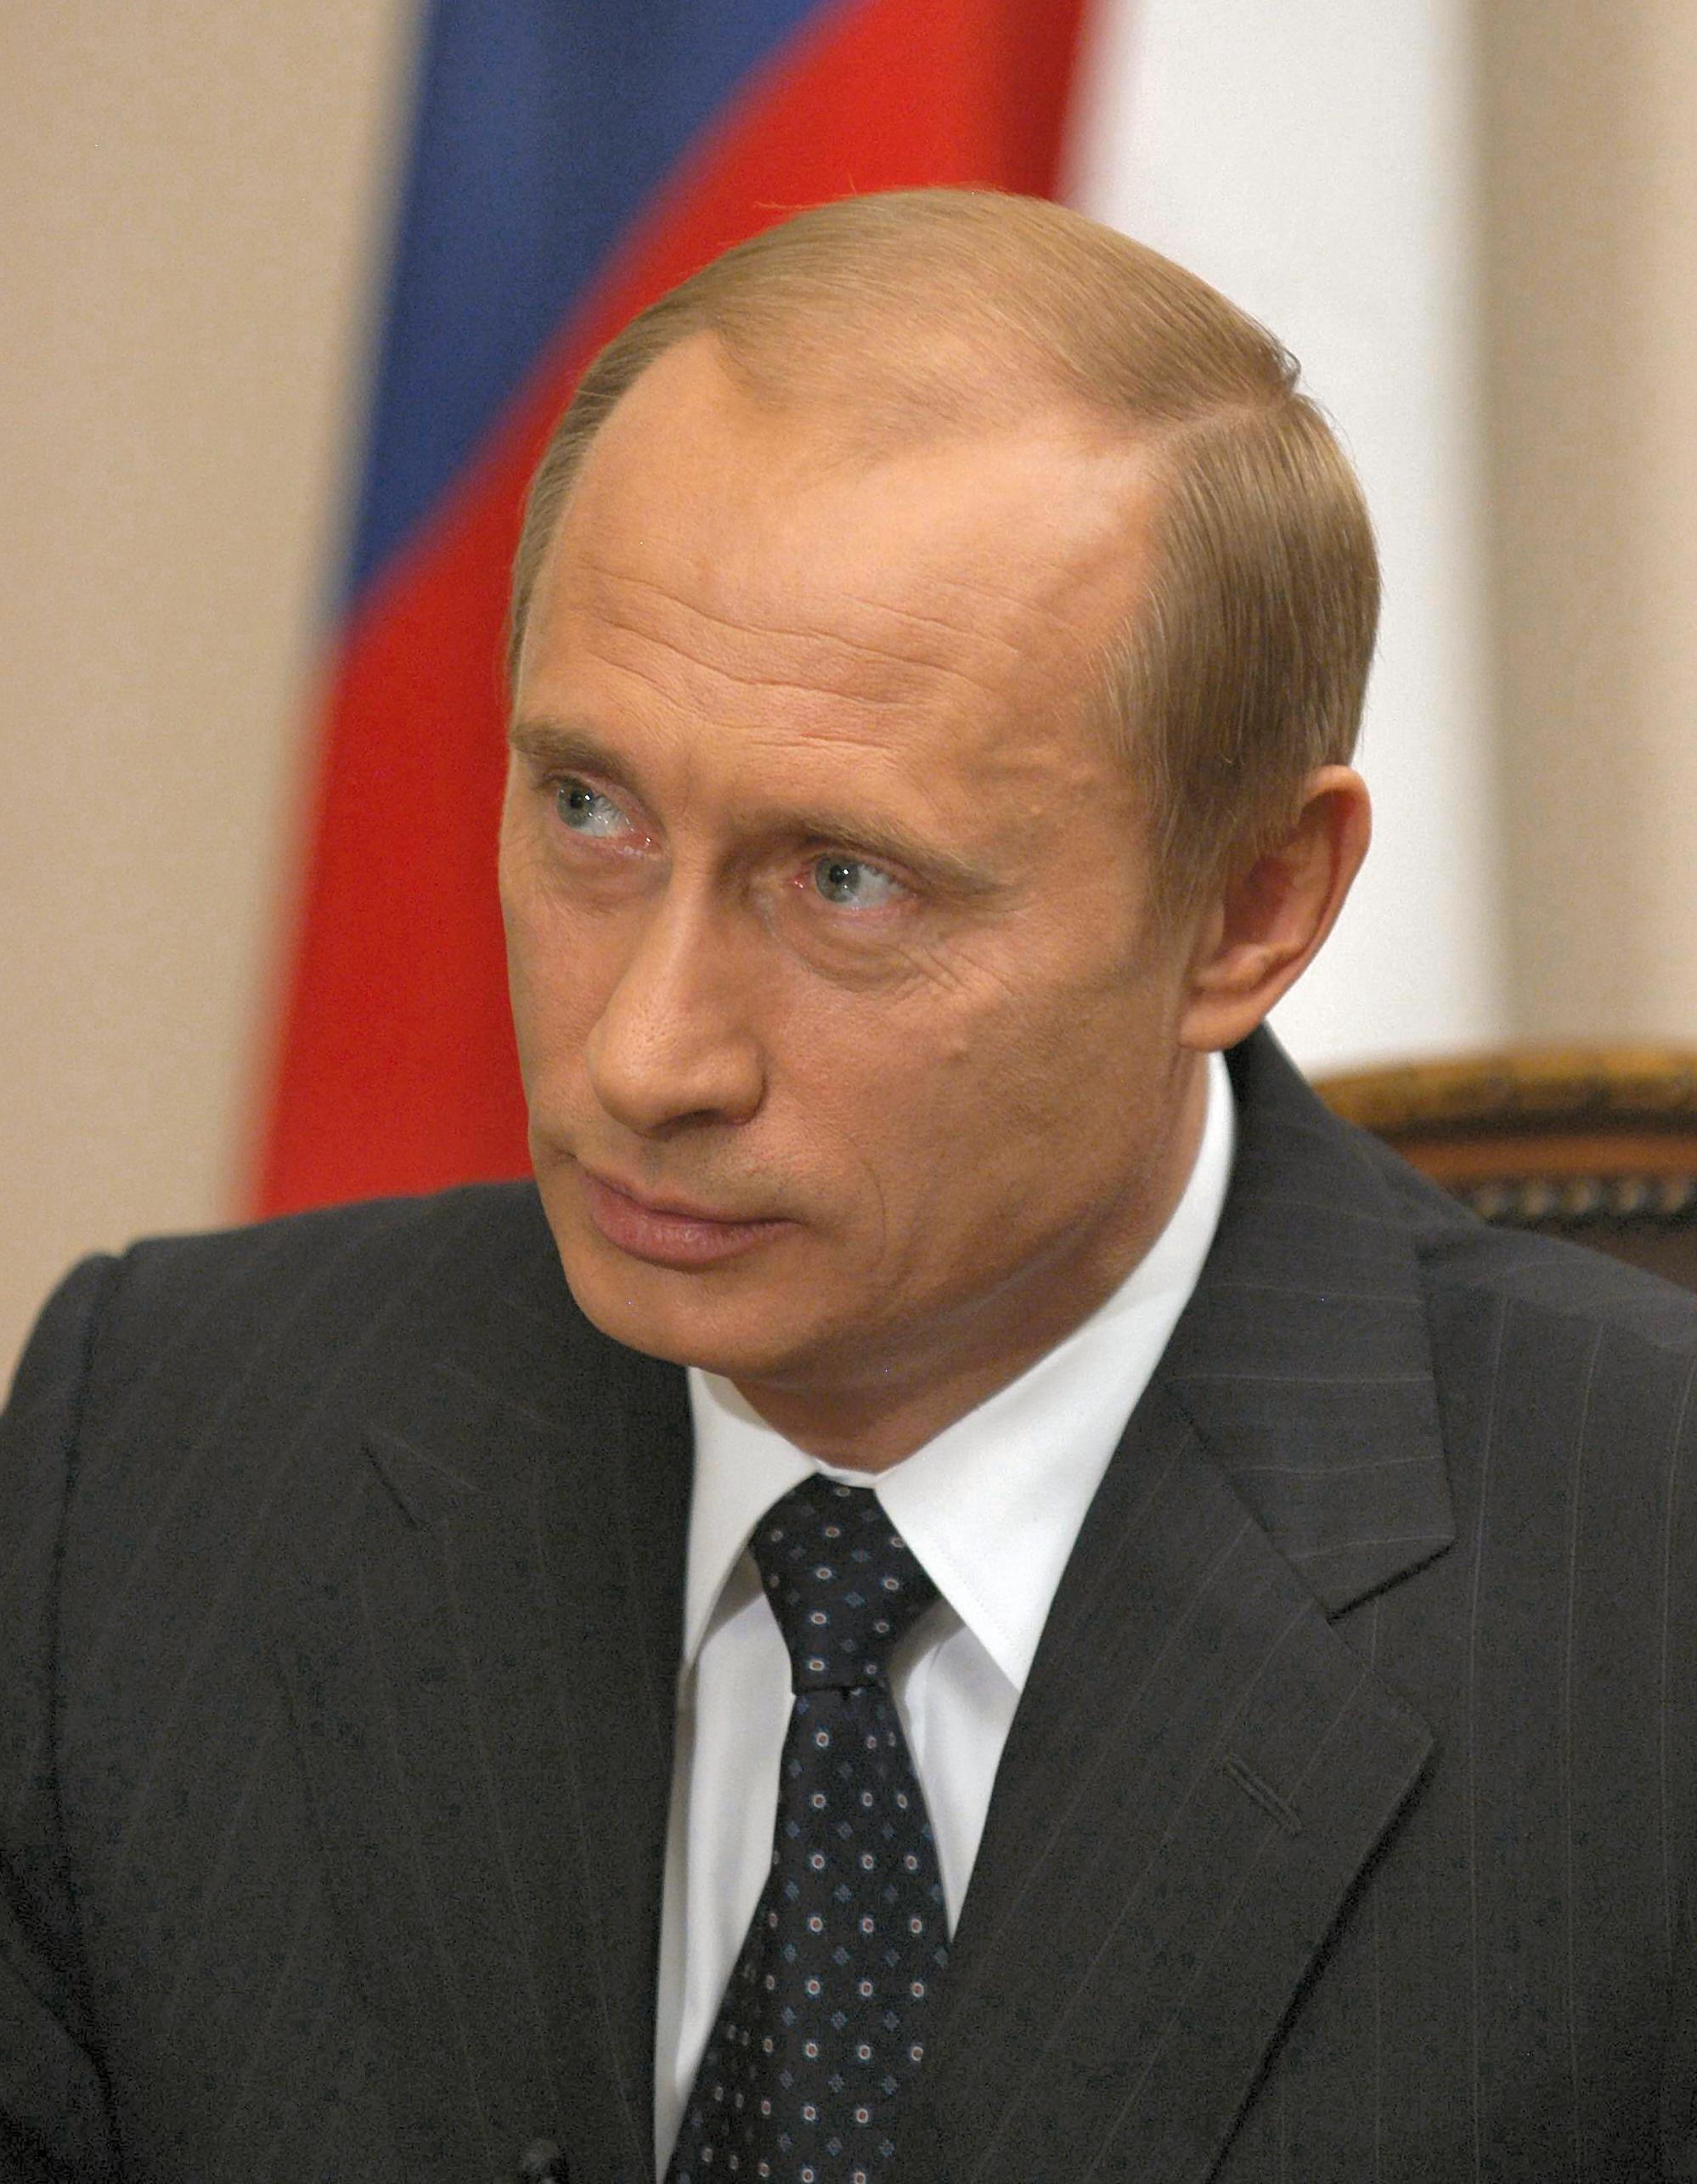 Source: www.kremlin.ru